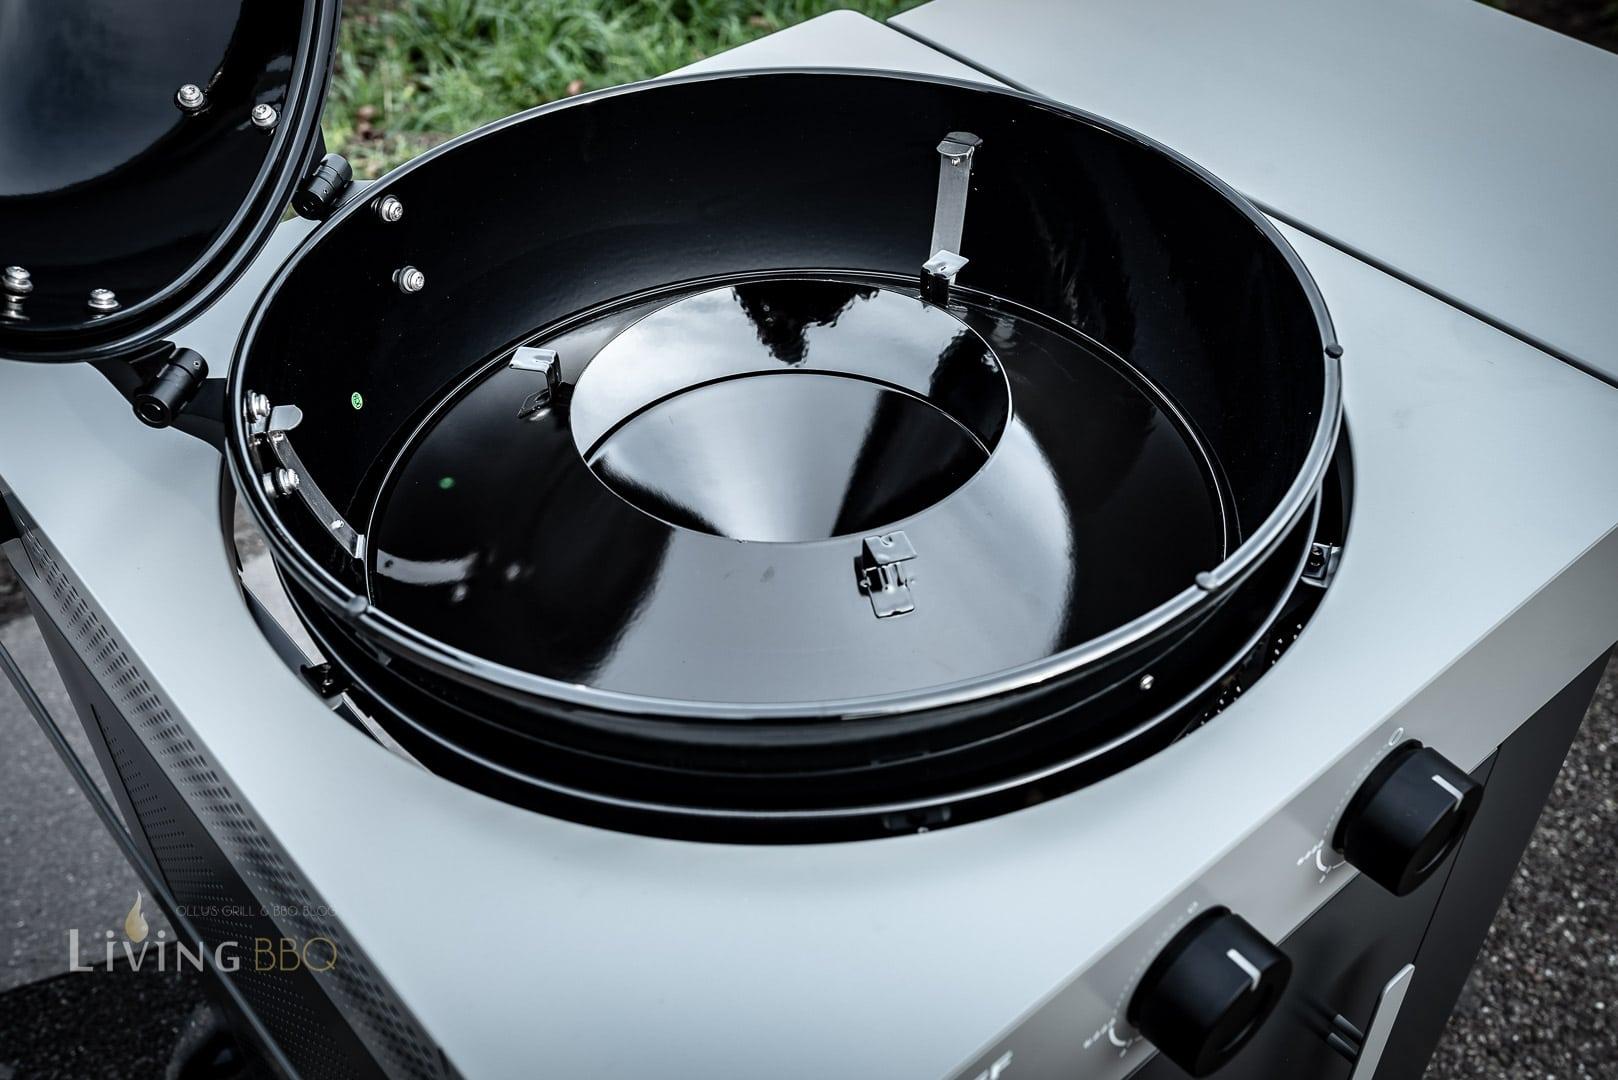 Vulkan Postion Outdoorchef Arosa 570 G